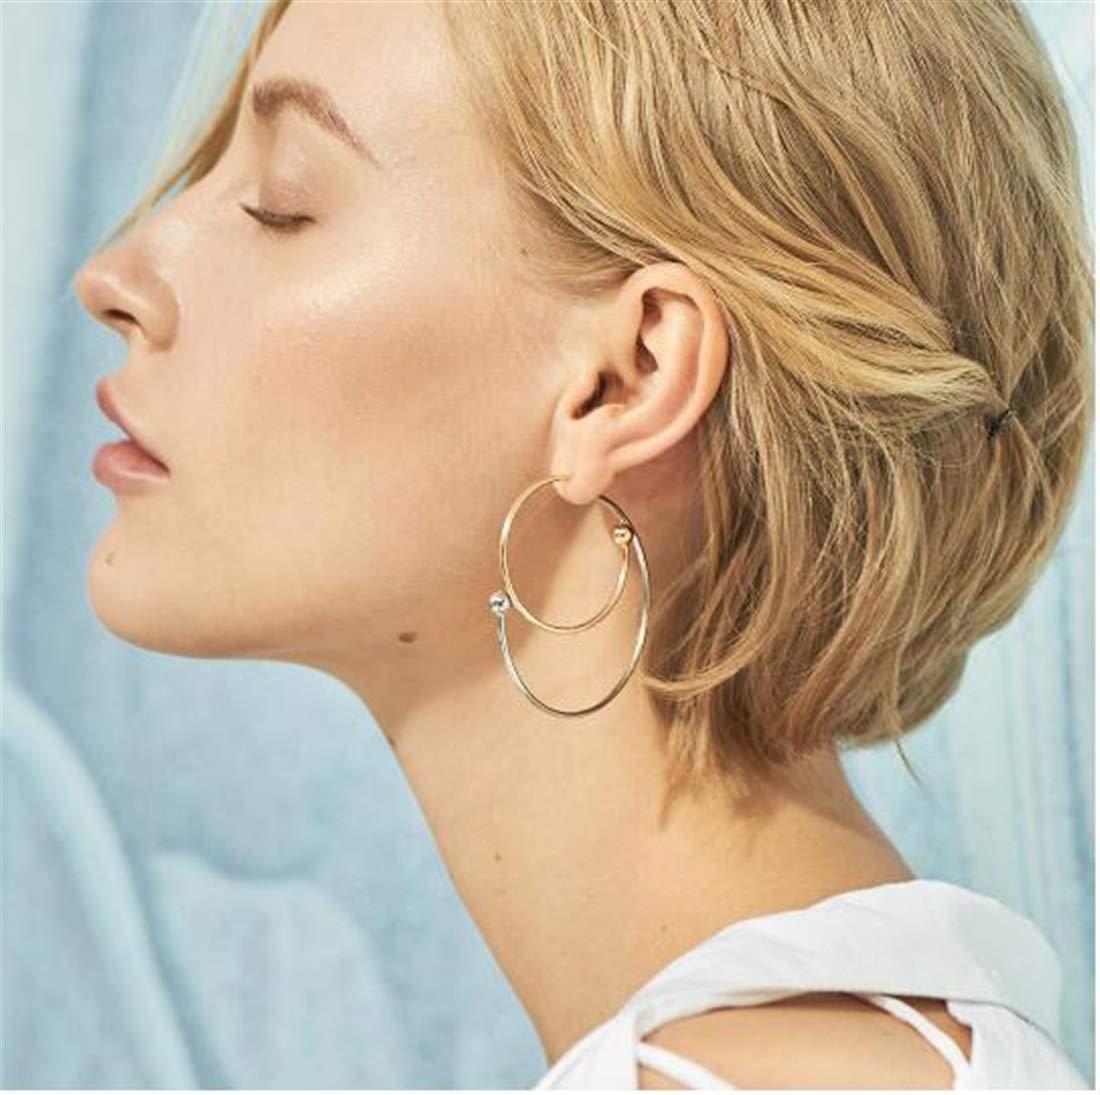 Tmrow 1pair Geometric Stud Earrings Double Sytle Circle Stud Earrings Jewelry For Women,1#